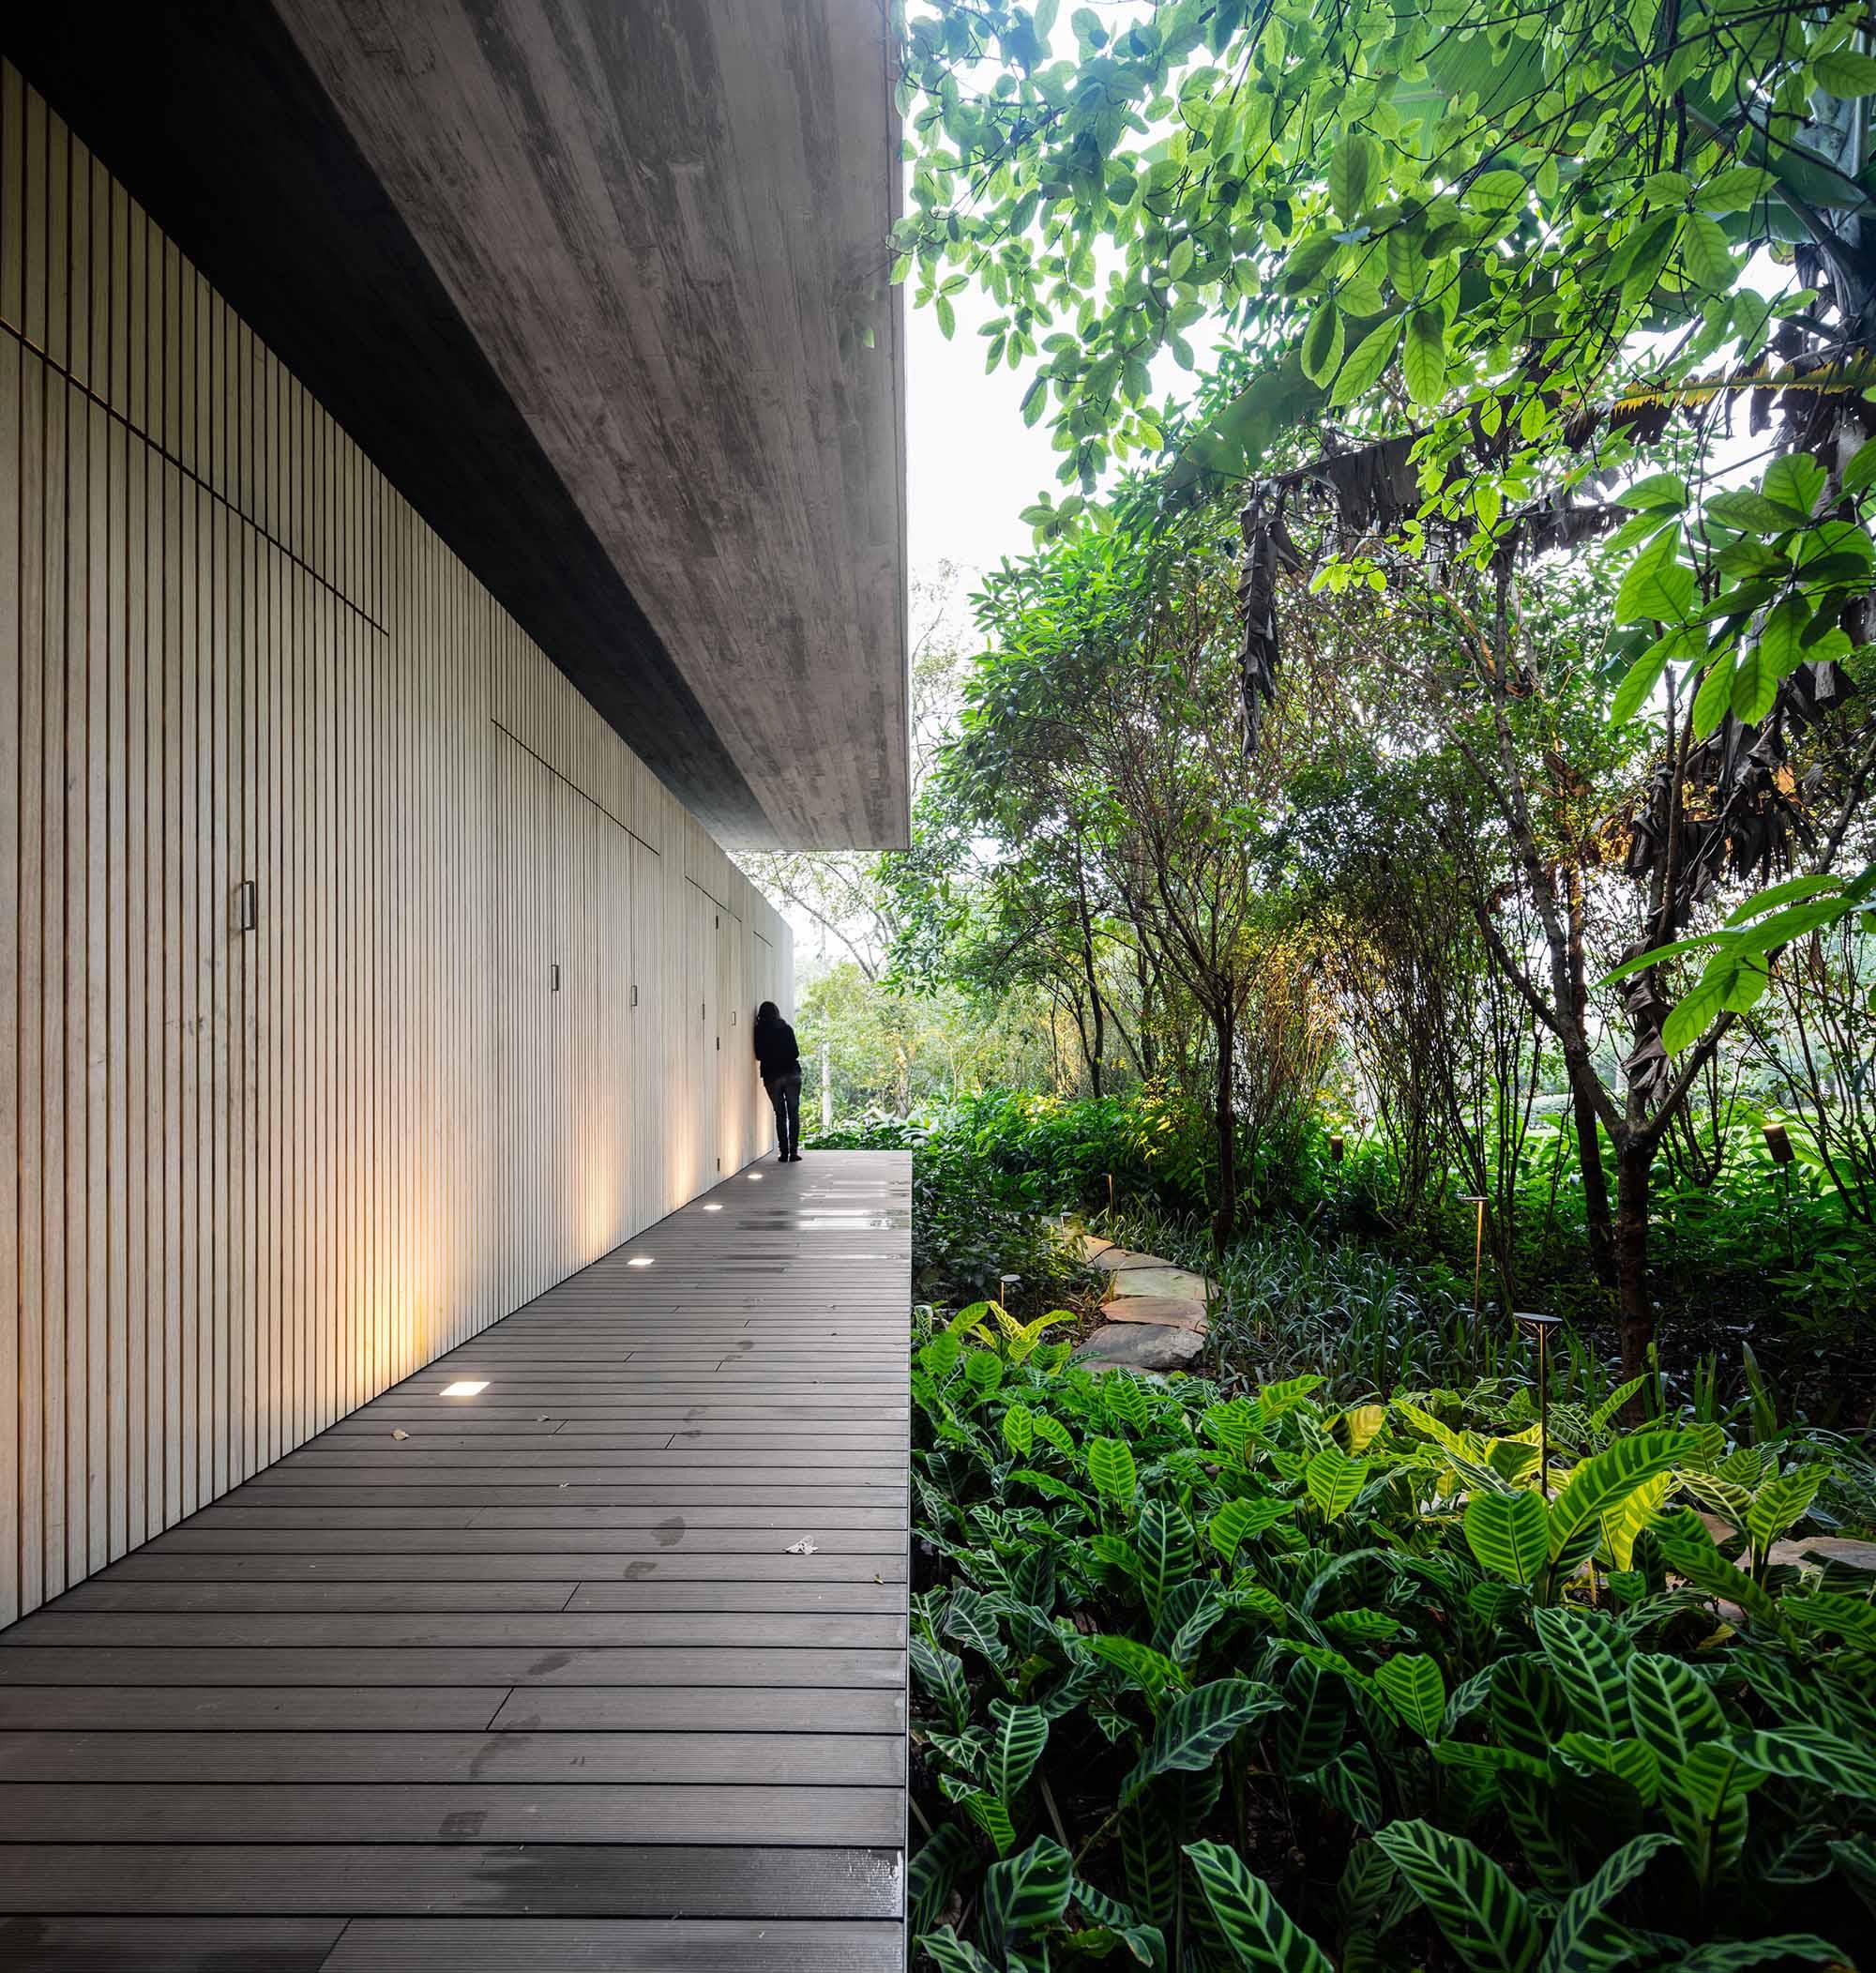 H-House-Life-Jungle-House-Casa-Da-Mata-studio-mk27-mk27_namata_fernandoguerra_medium(11).JPG